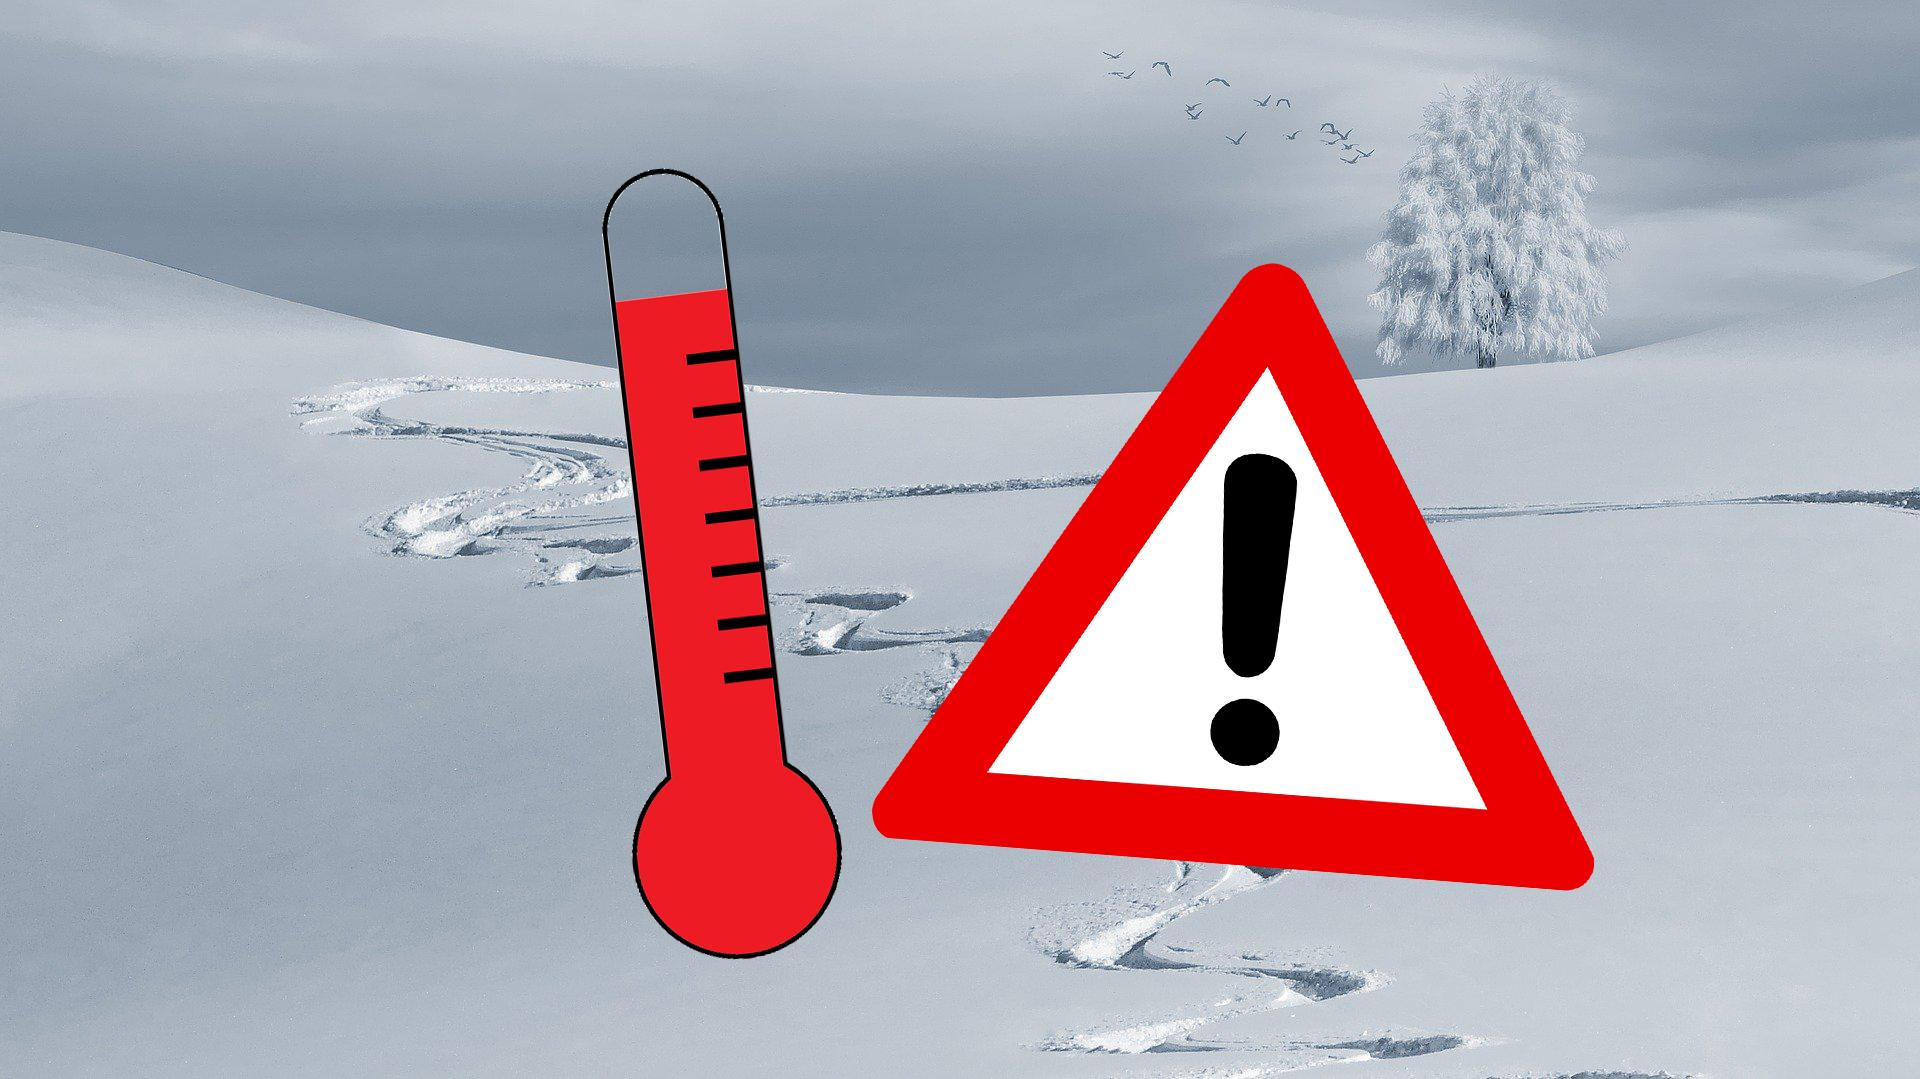 Wissenschaftler: Wärmster Winter aller Zeiten in Europa